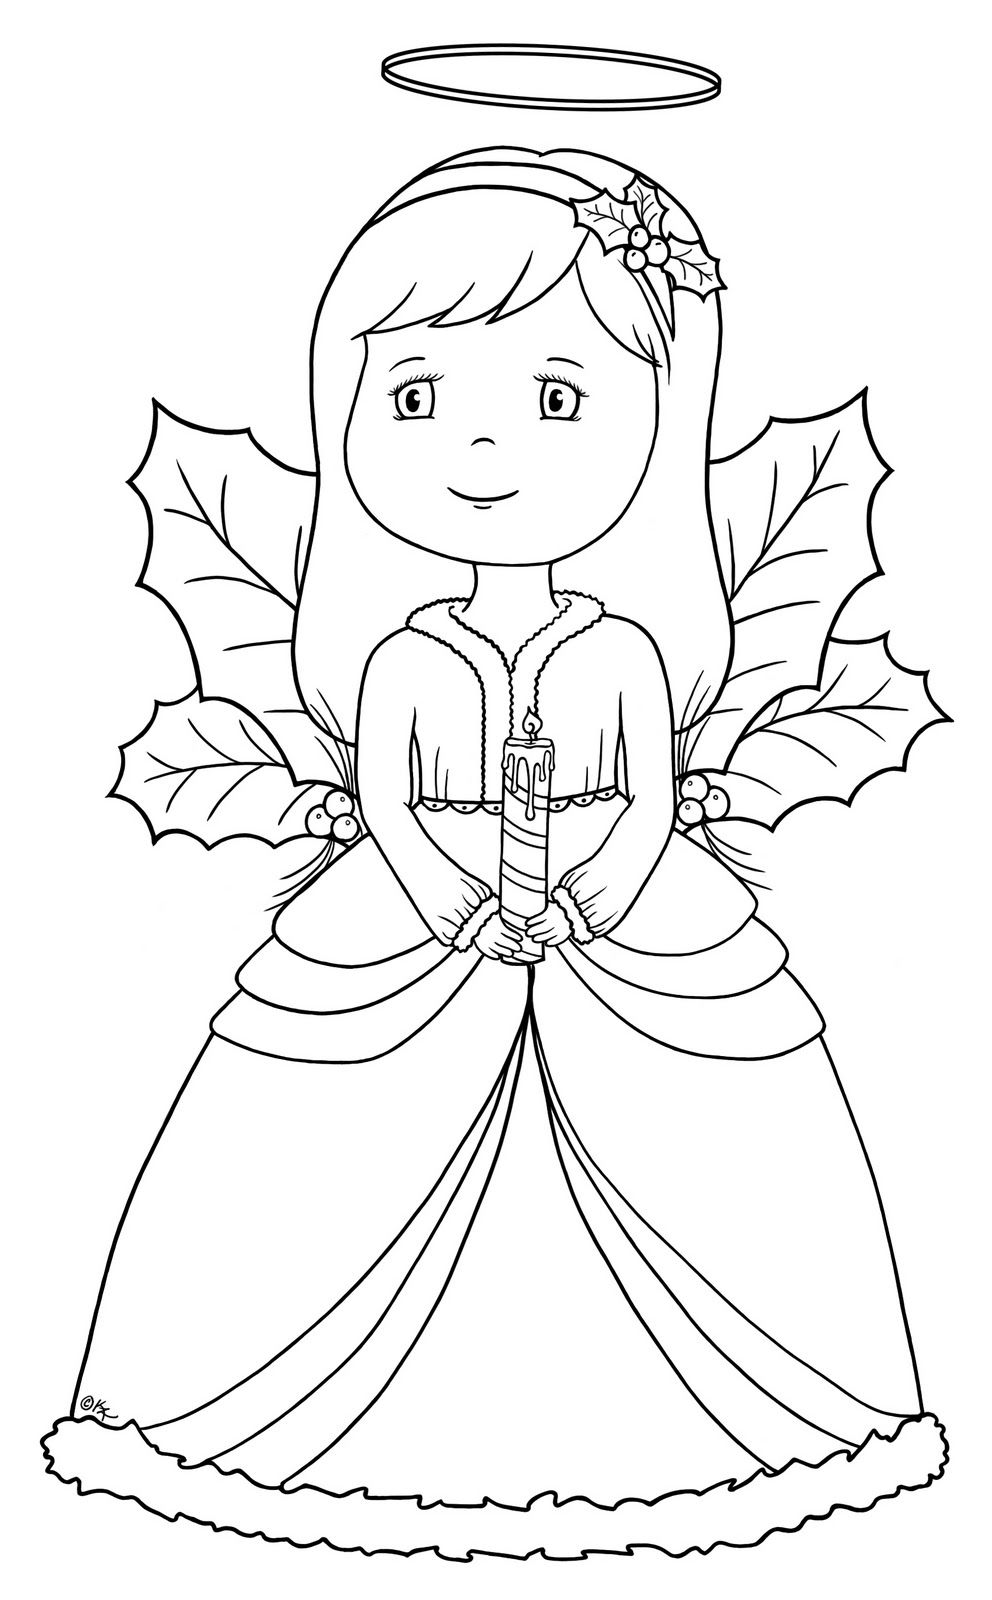 Xmas2 Angel2 Bearywishes Blogspot Com Jpg 992 1 600 Pixels Angel Coloring Pages Coloring Pages Christmas Angels